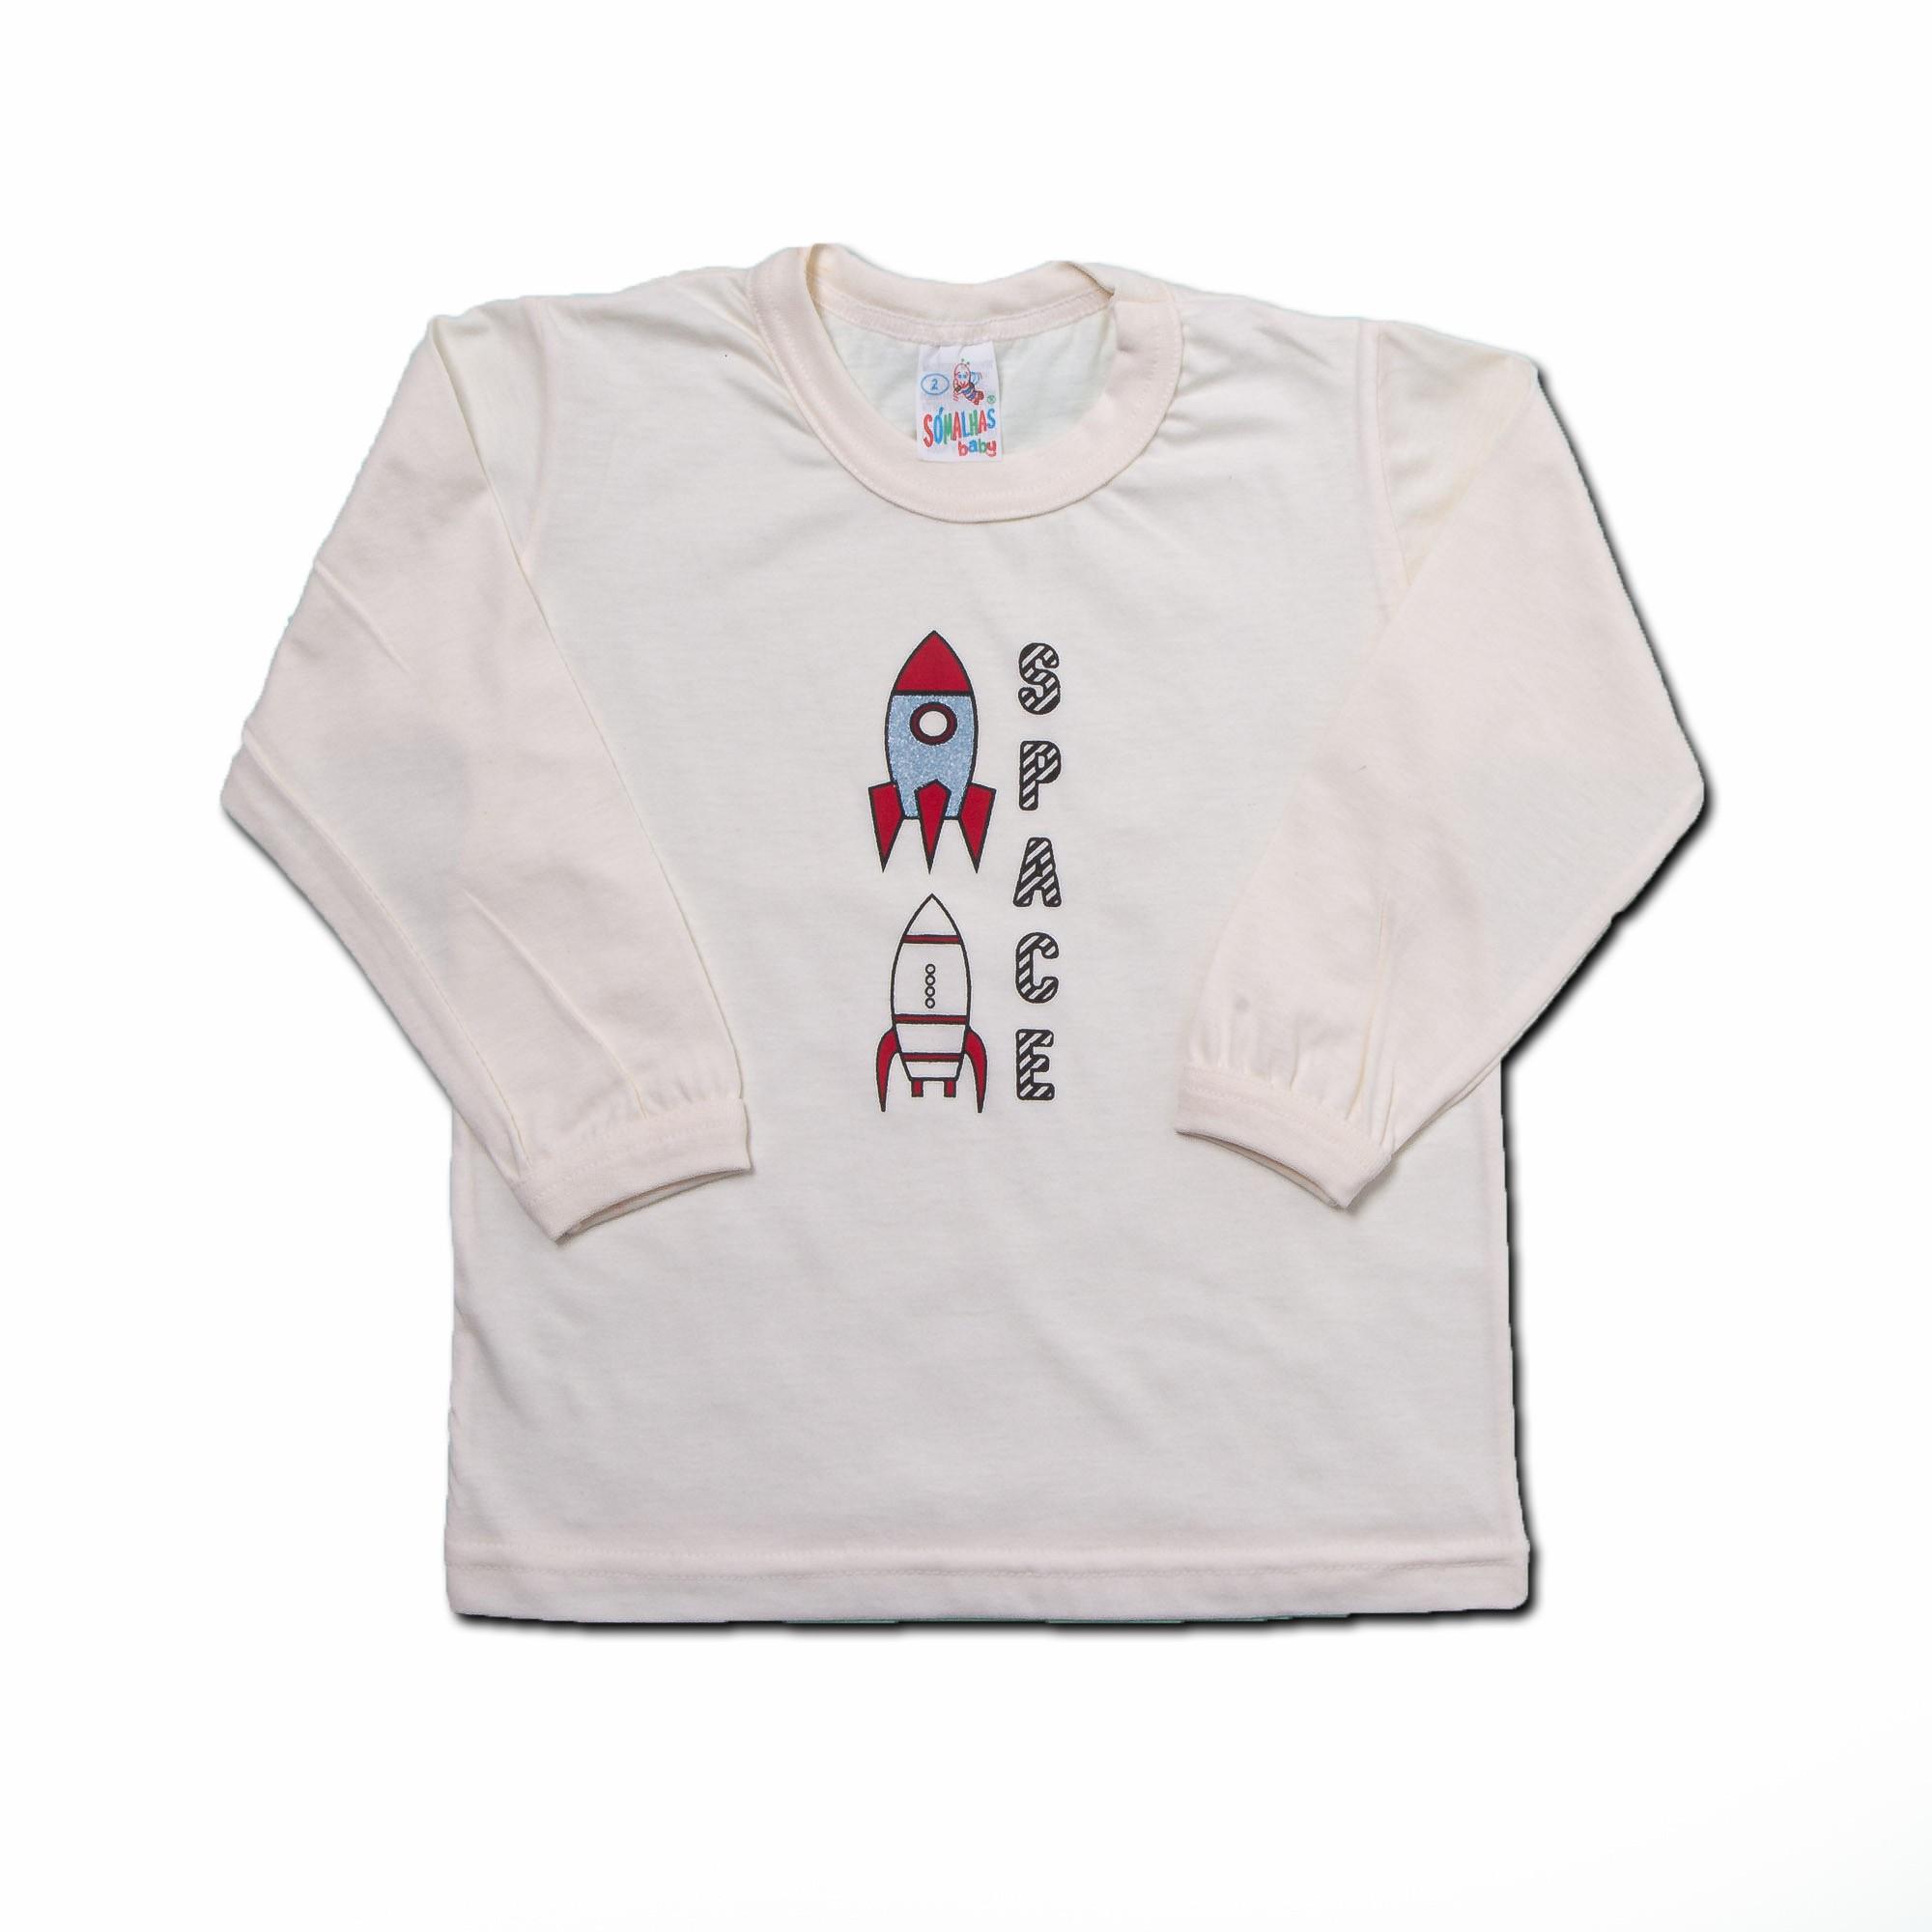 Camiseta Para Bebê Manga Longa Estampado Só Malhas